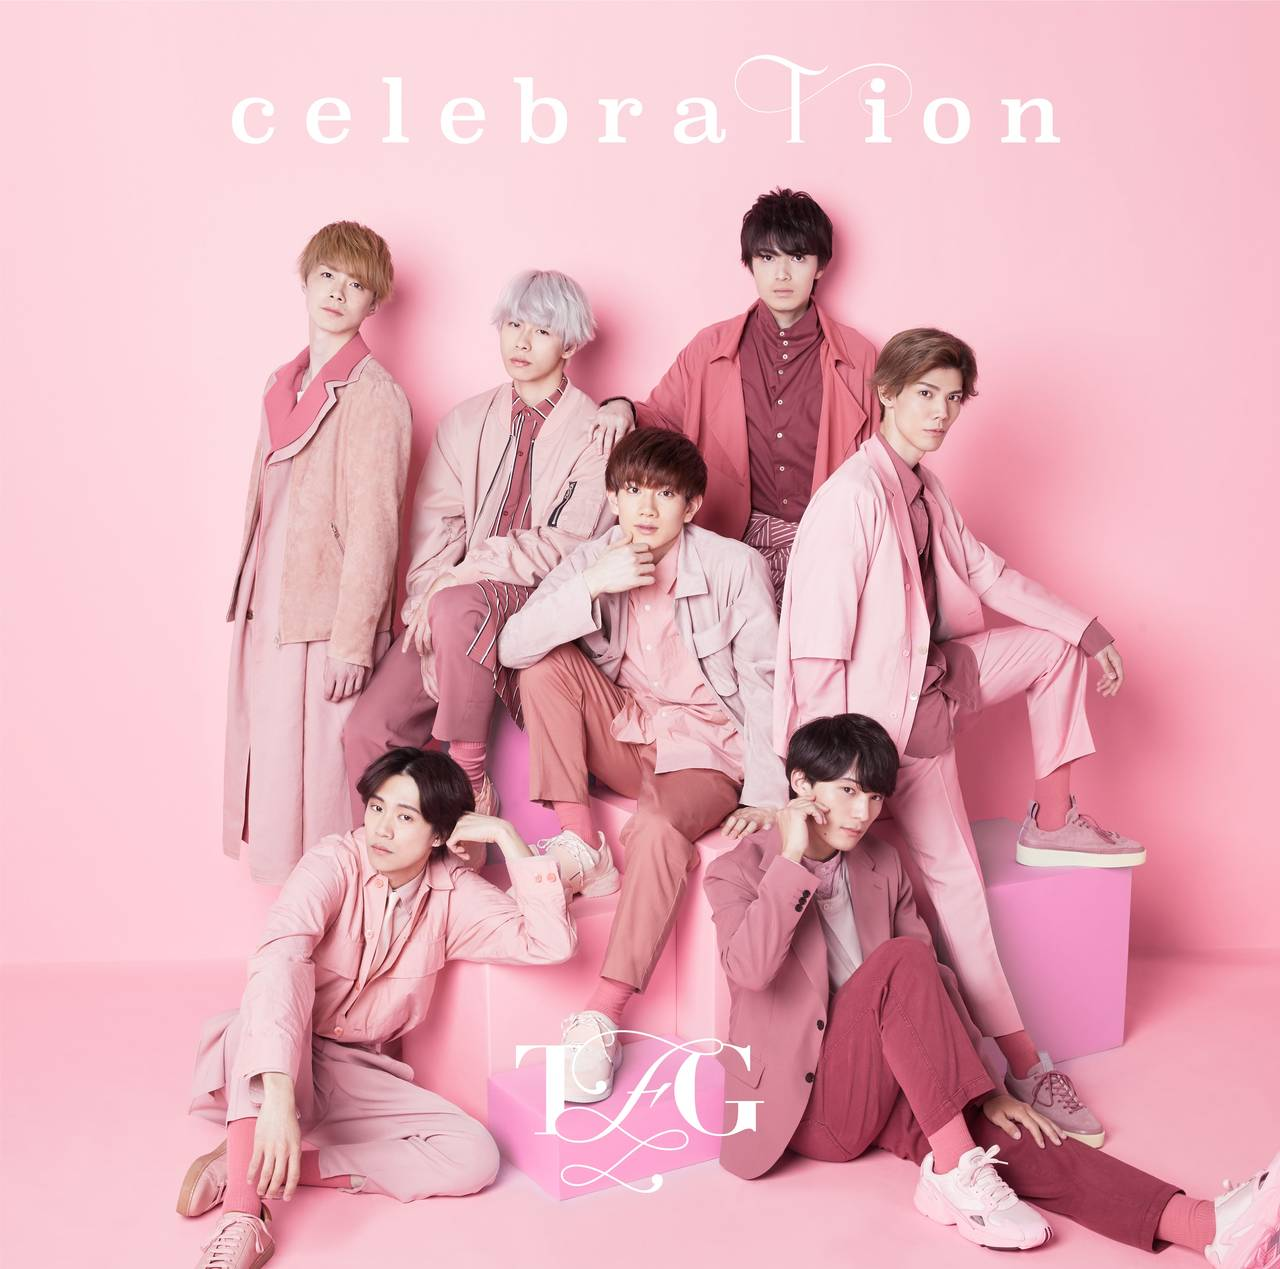 TFG 1stアルバム『celebraTion』3